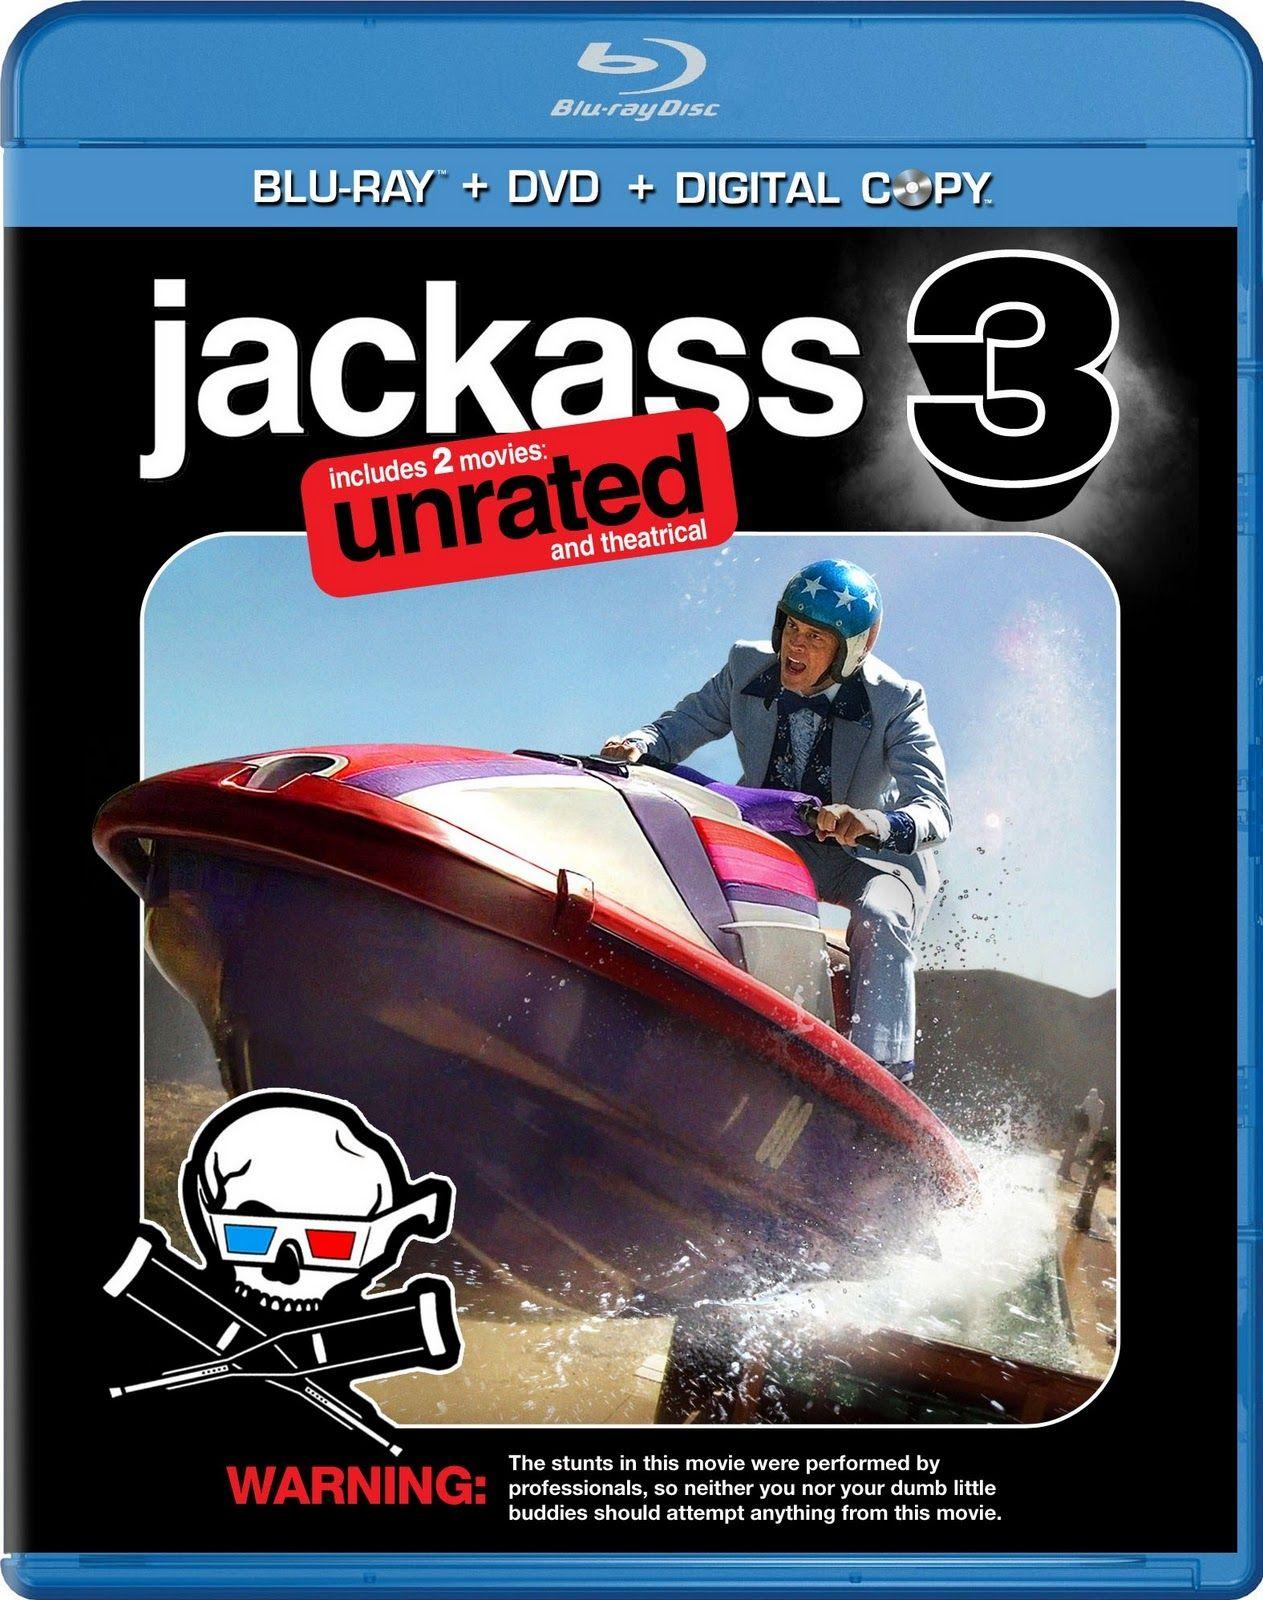 Jackass season 3 soundtrack